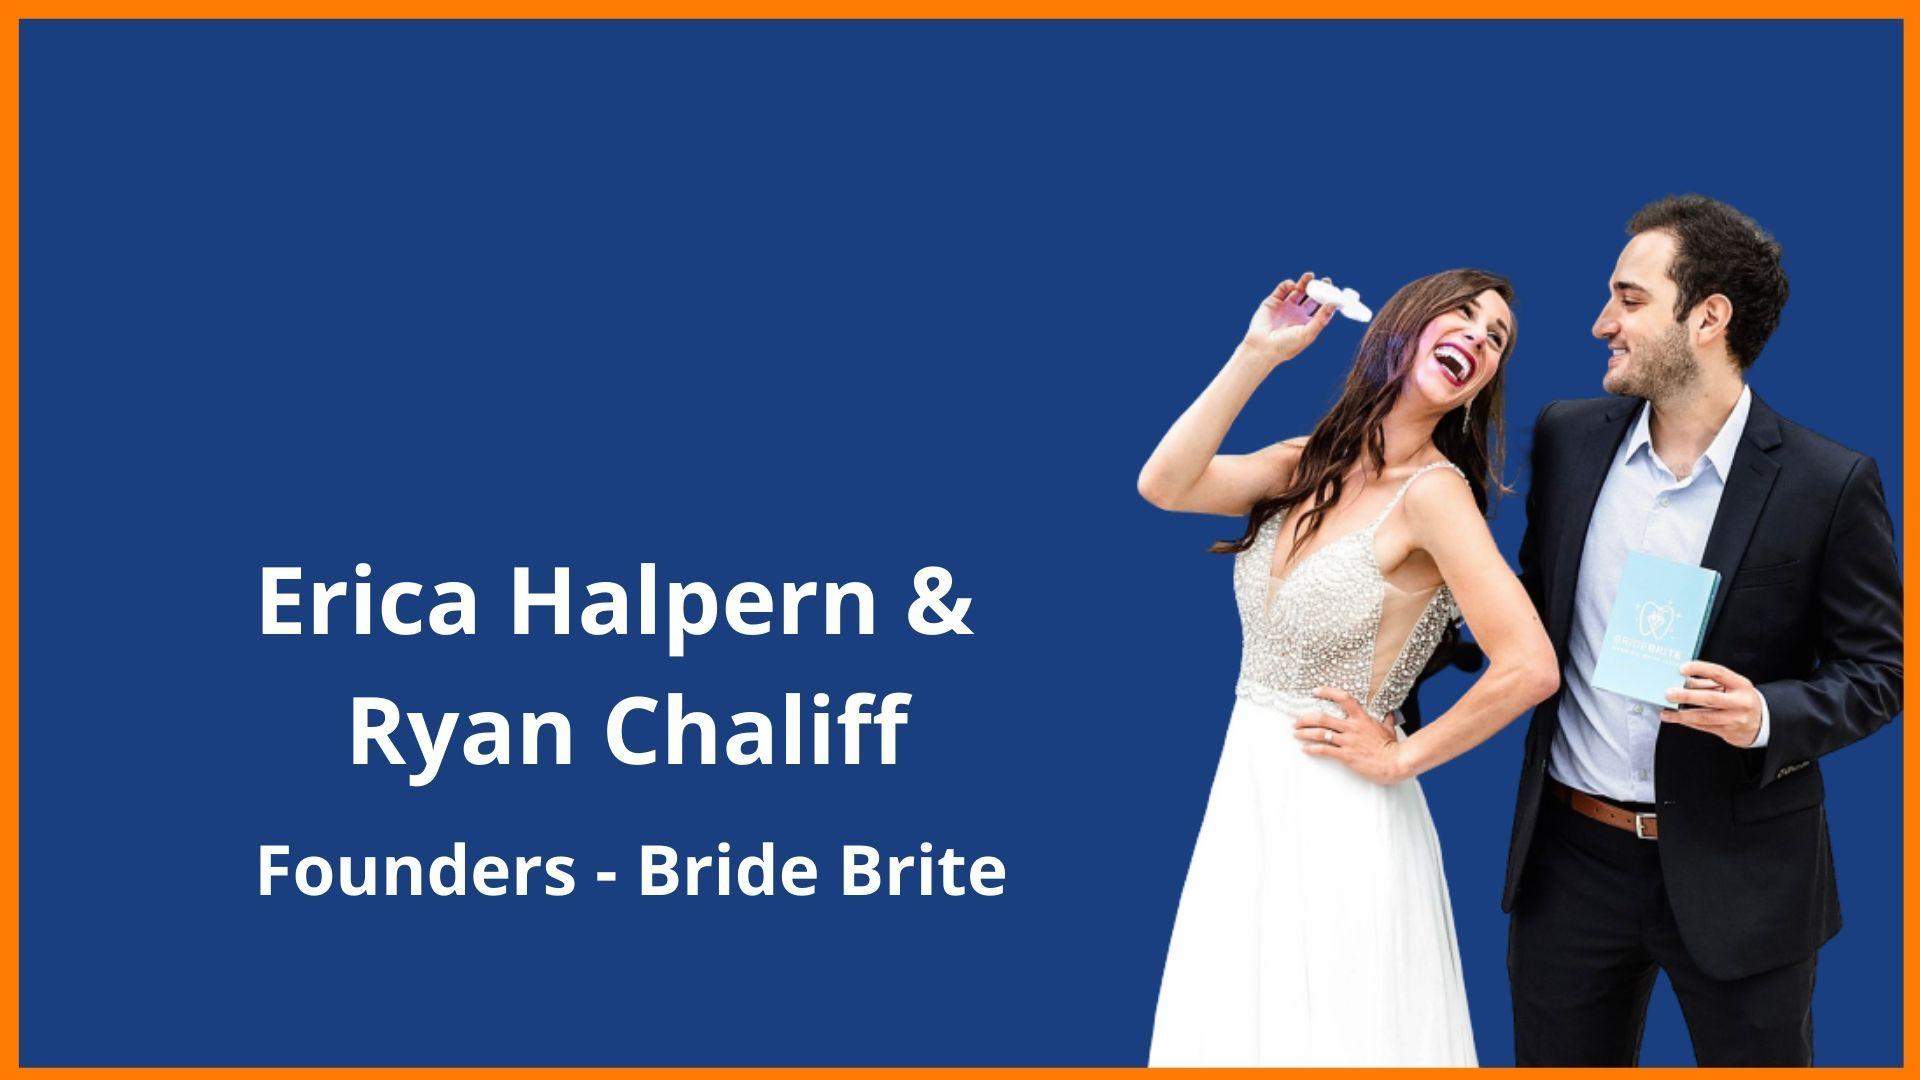 Bride Brite - From Wedding Blues to Wedding Whites!